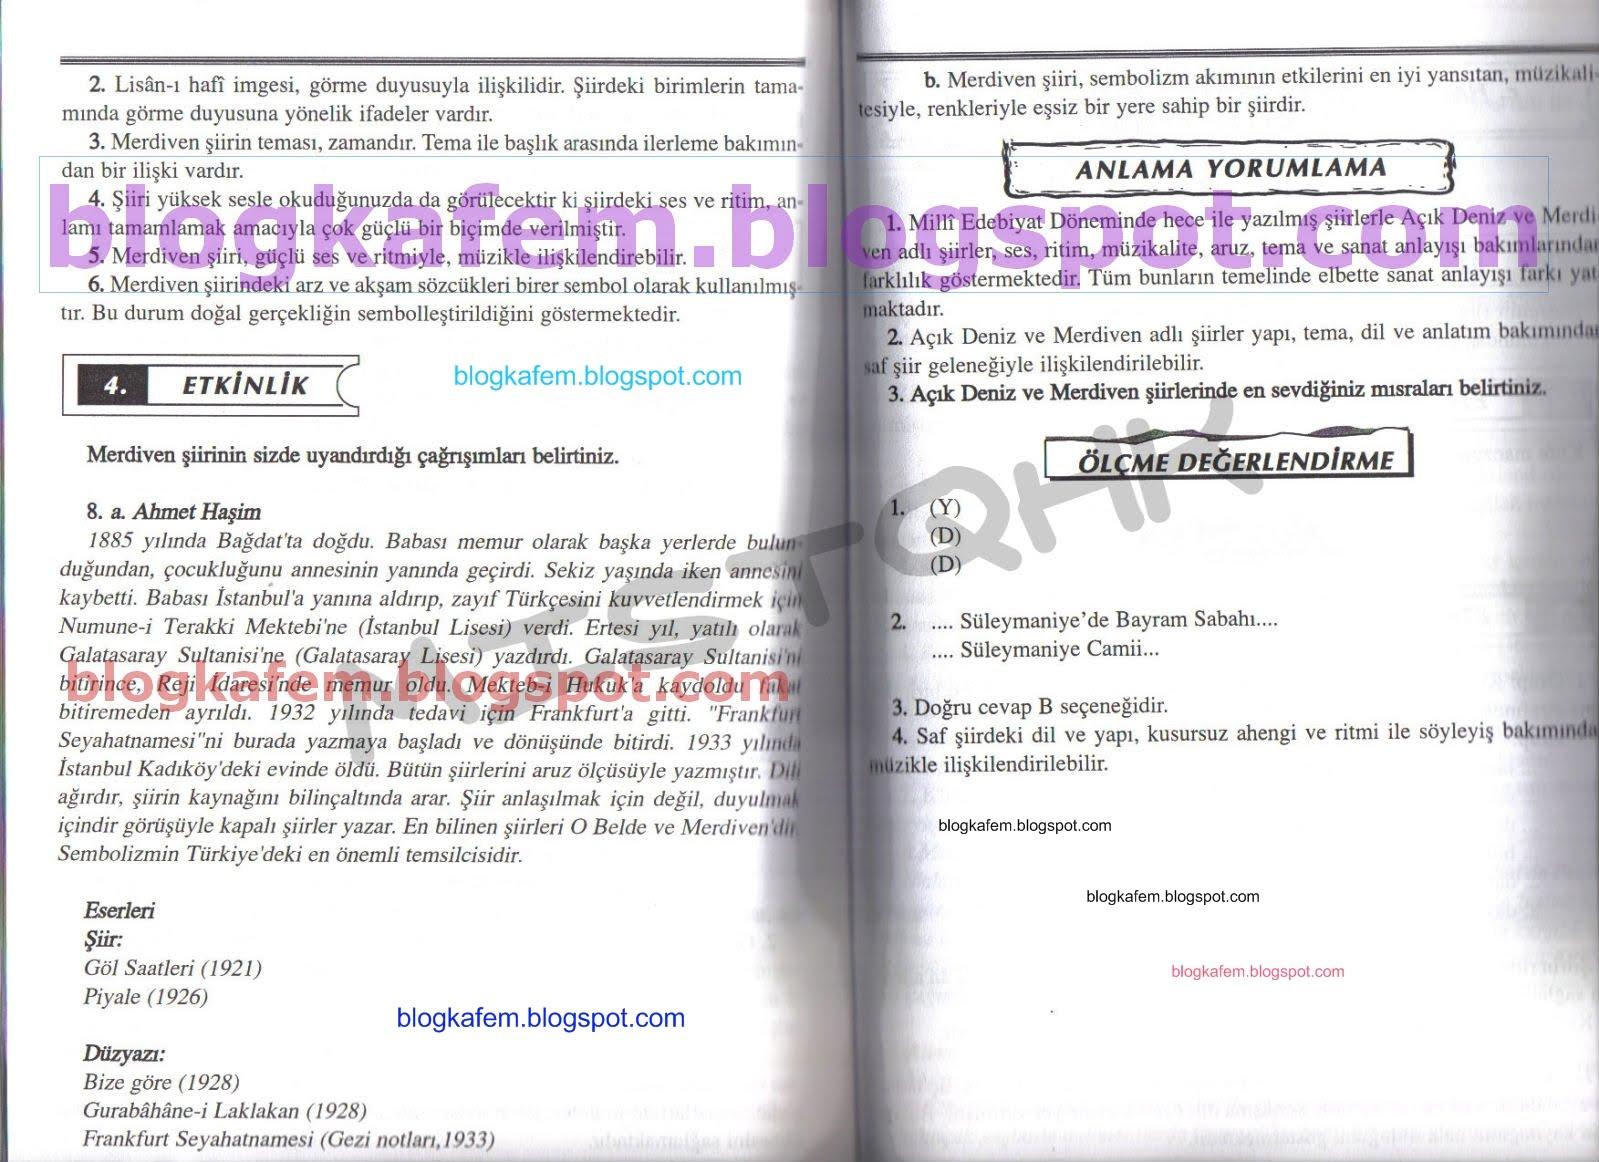 http://1.bp.blogspot.com/_TEHPOXWTin0/S91aGMoBDkI/AAAAAAAAA1g/qGlVo6XCxpk/s1600/Sayfa173-174.jpg